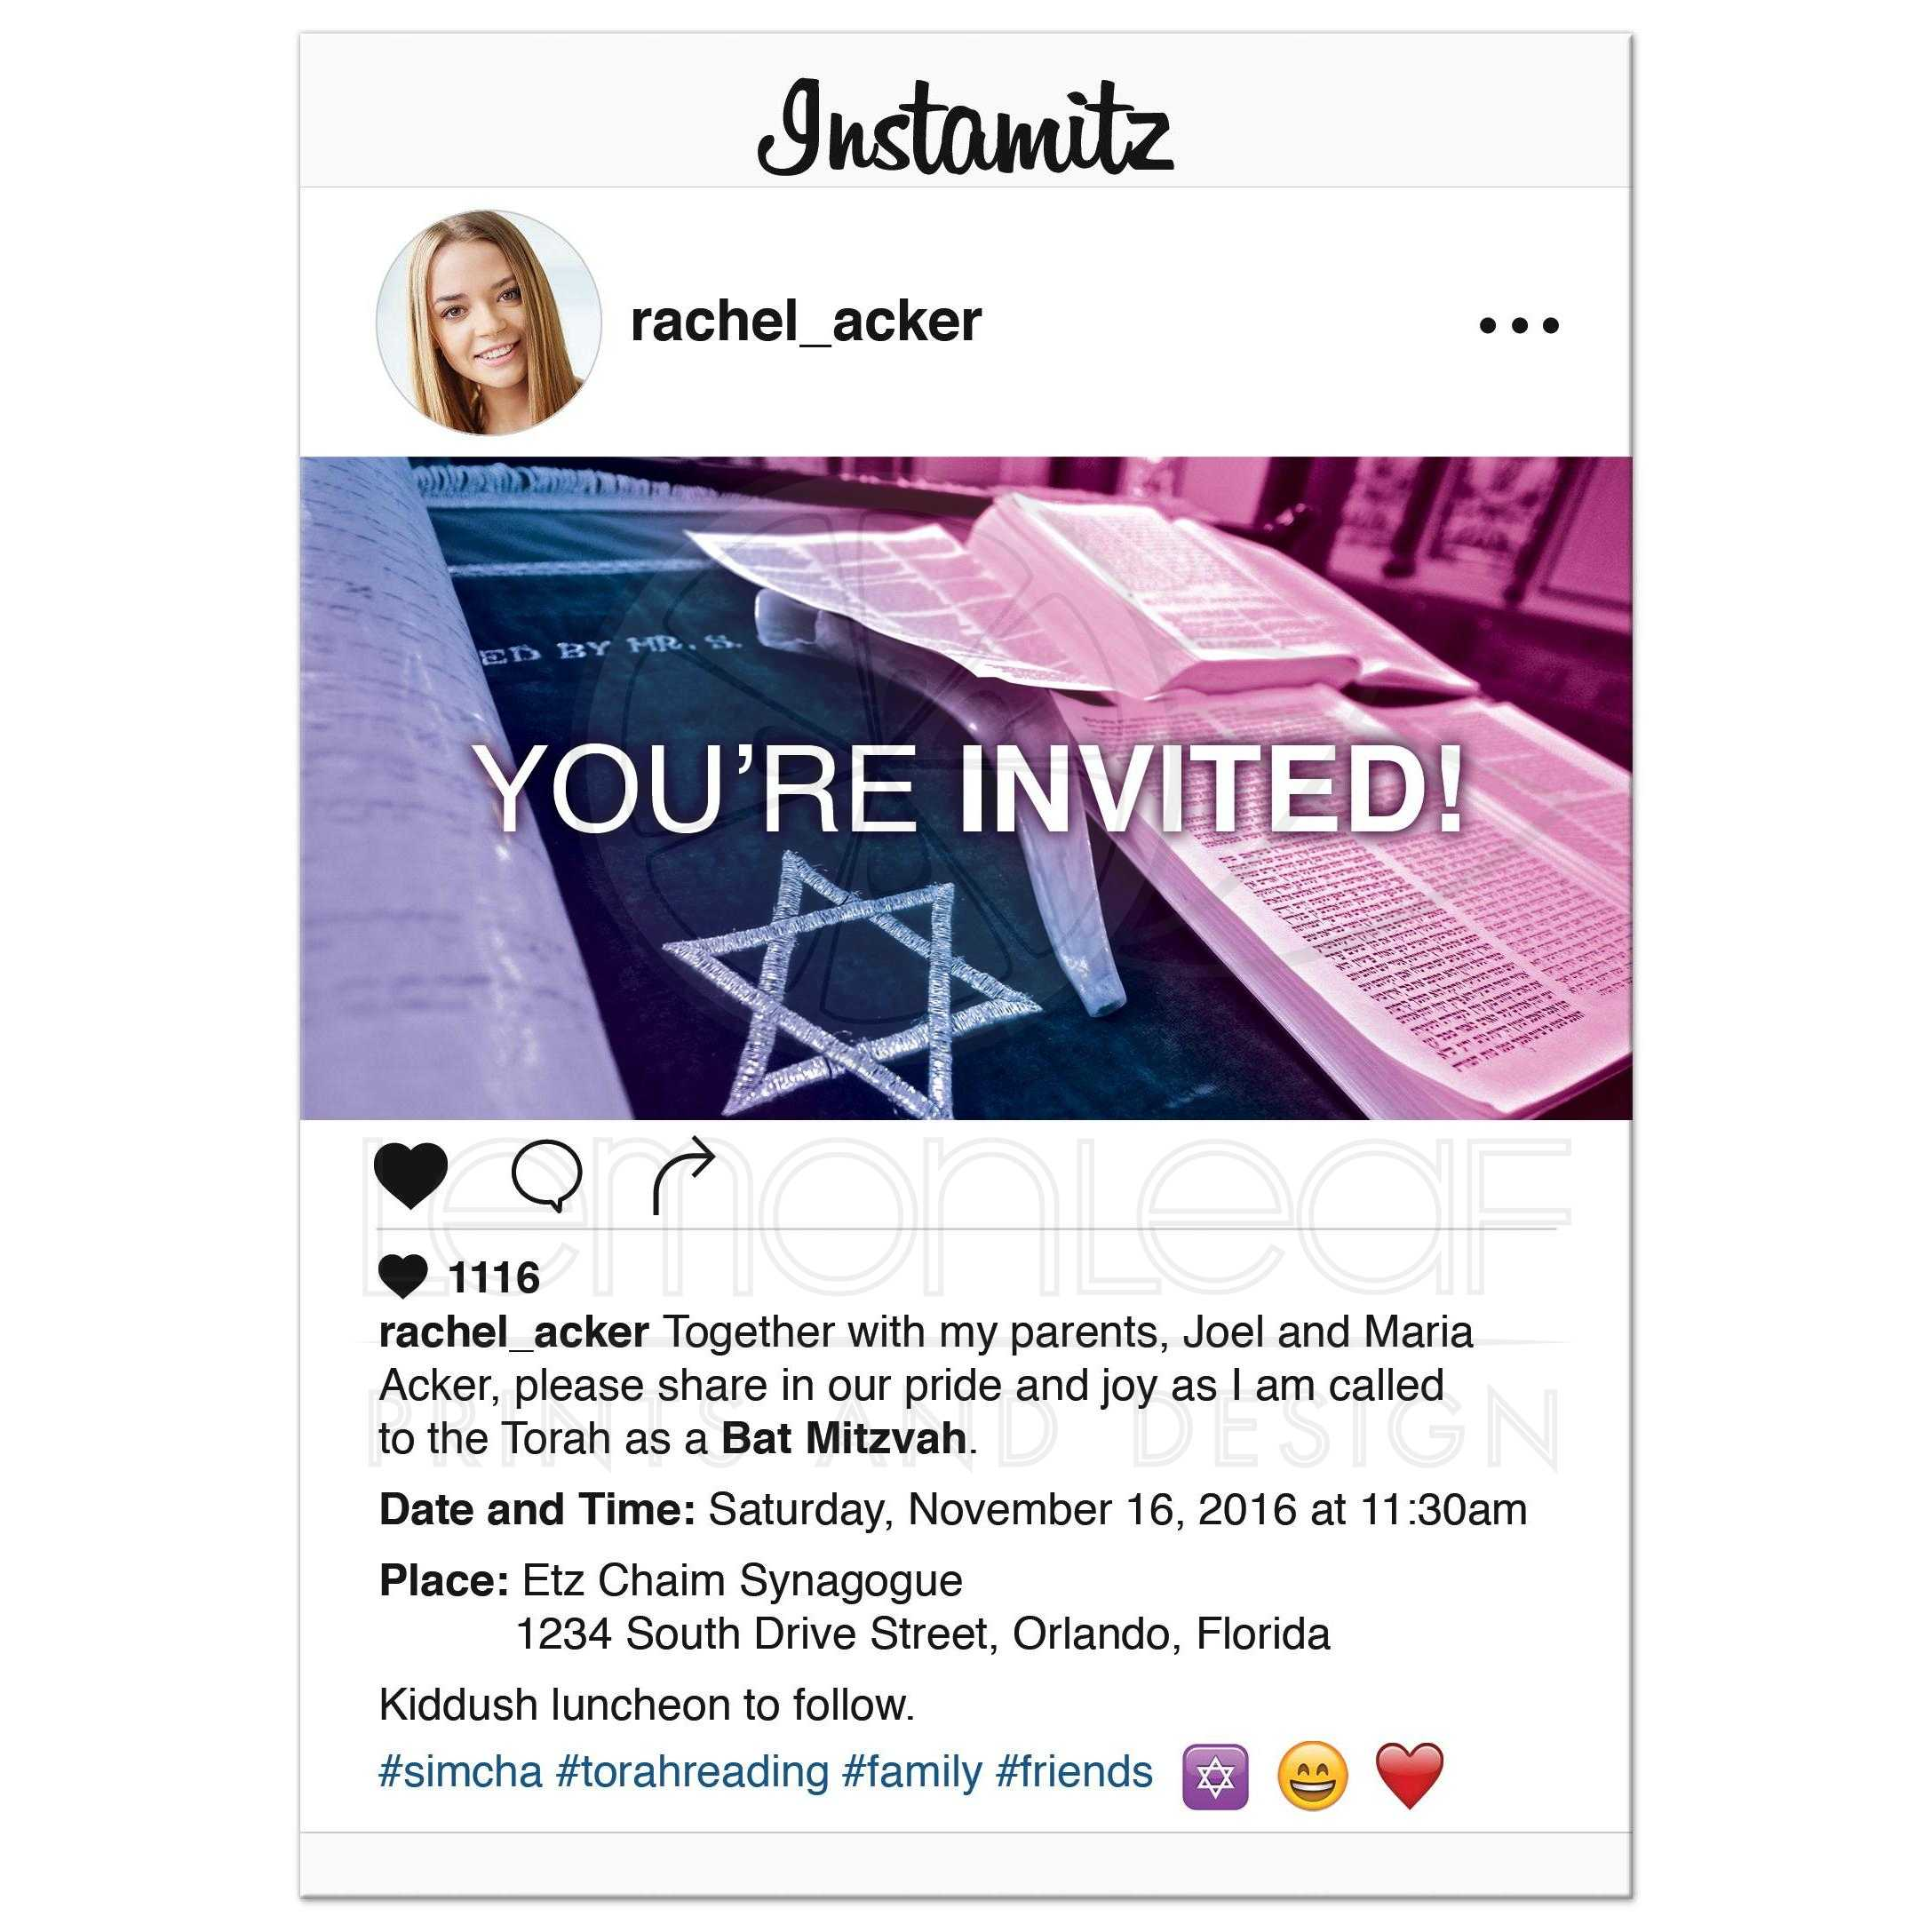 Fun And Unique Photo Sharing Social Media Bat Mitzvah Invitation